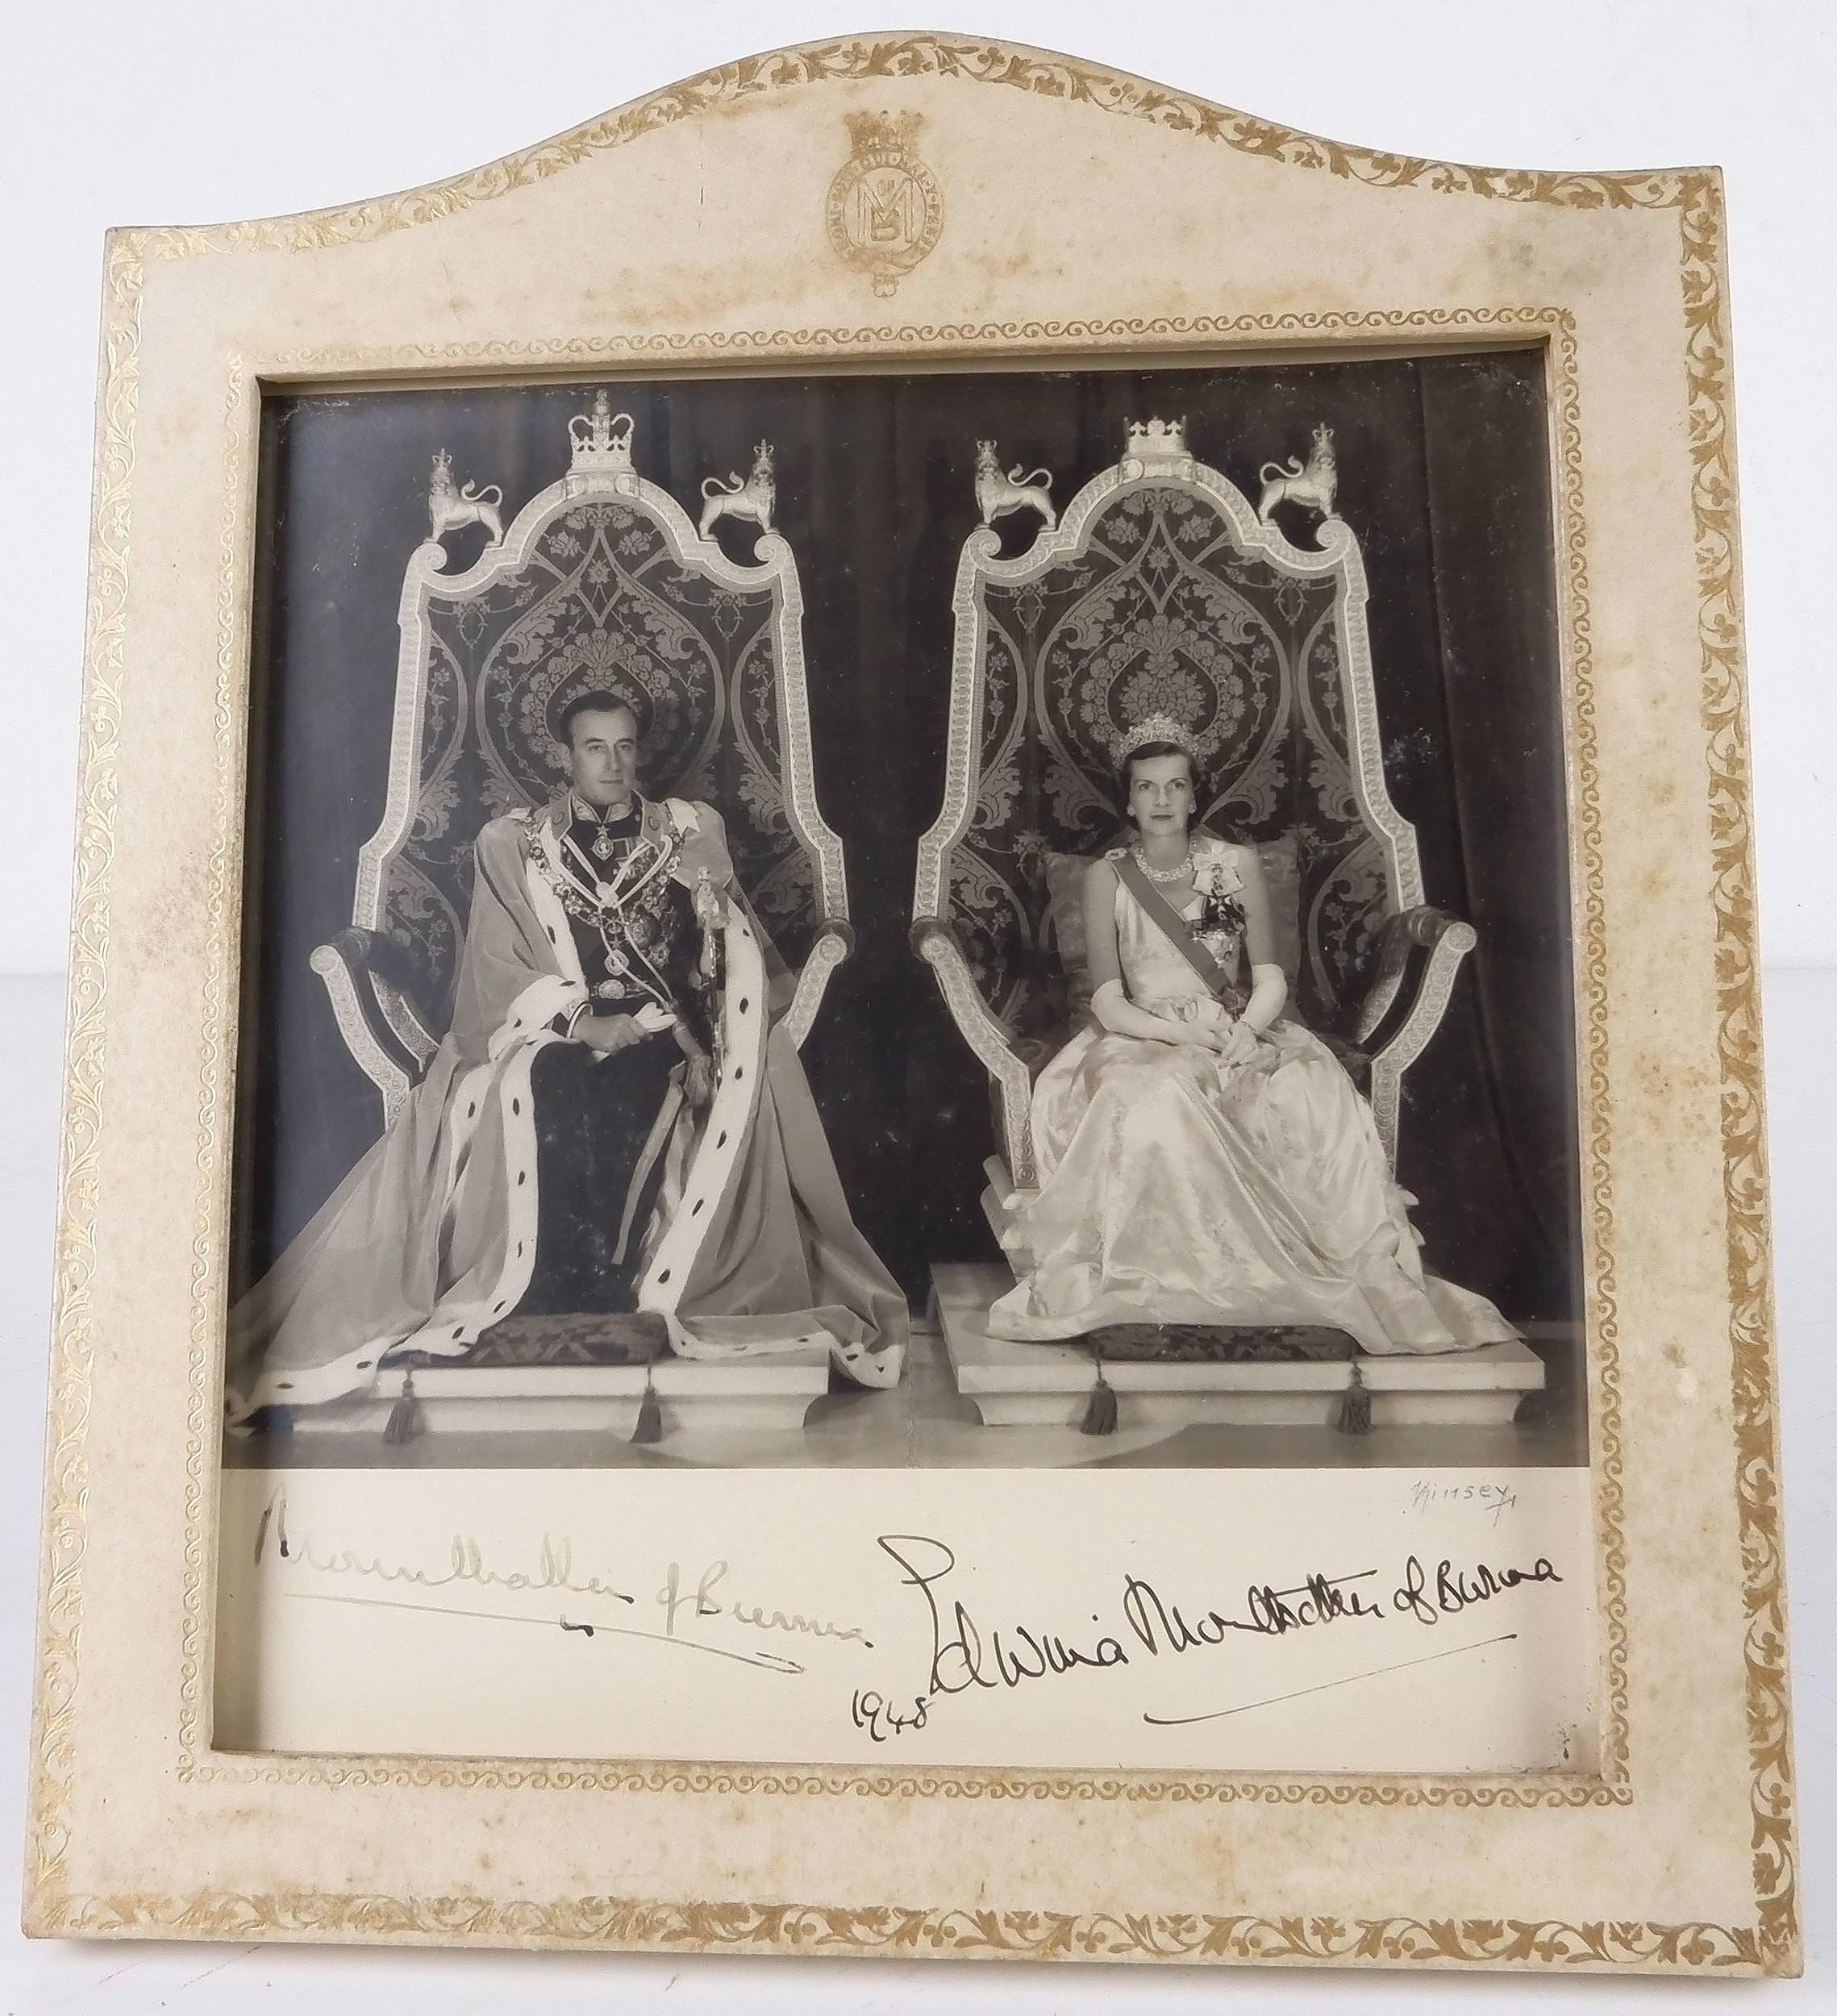 'Signed Photo of Louis Mountbatten, 1st Earl Mountbatten of Burma and Countess Edwina Ashley'